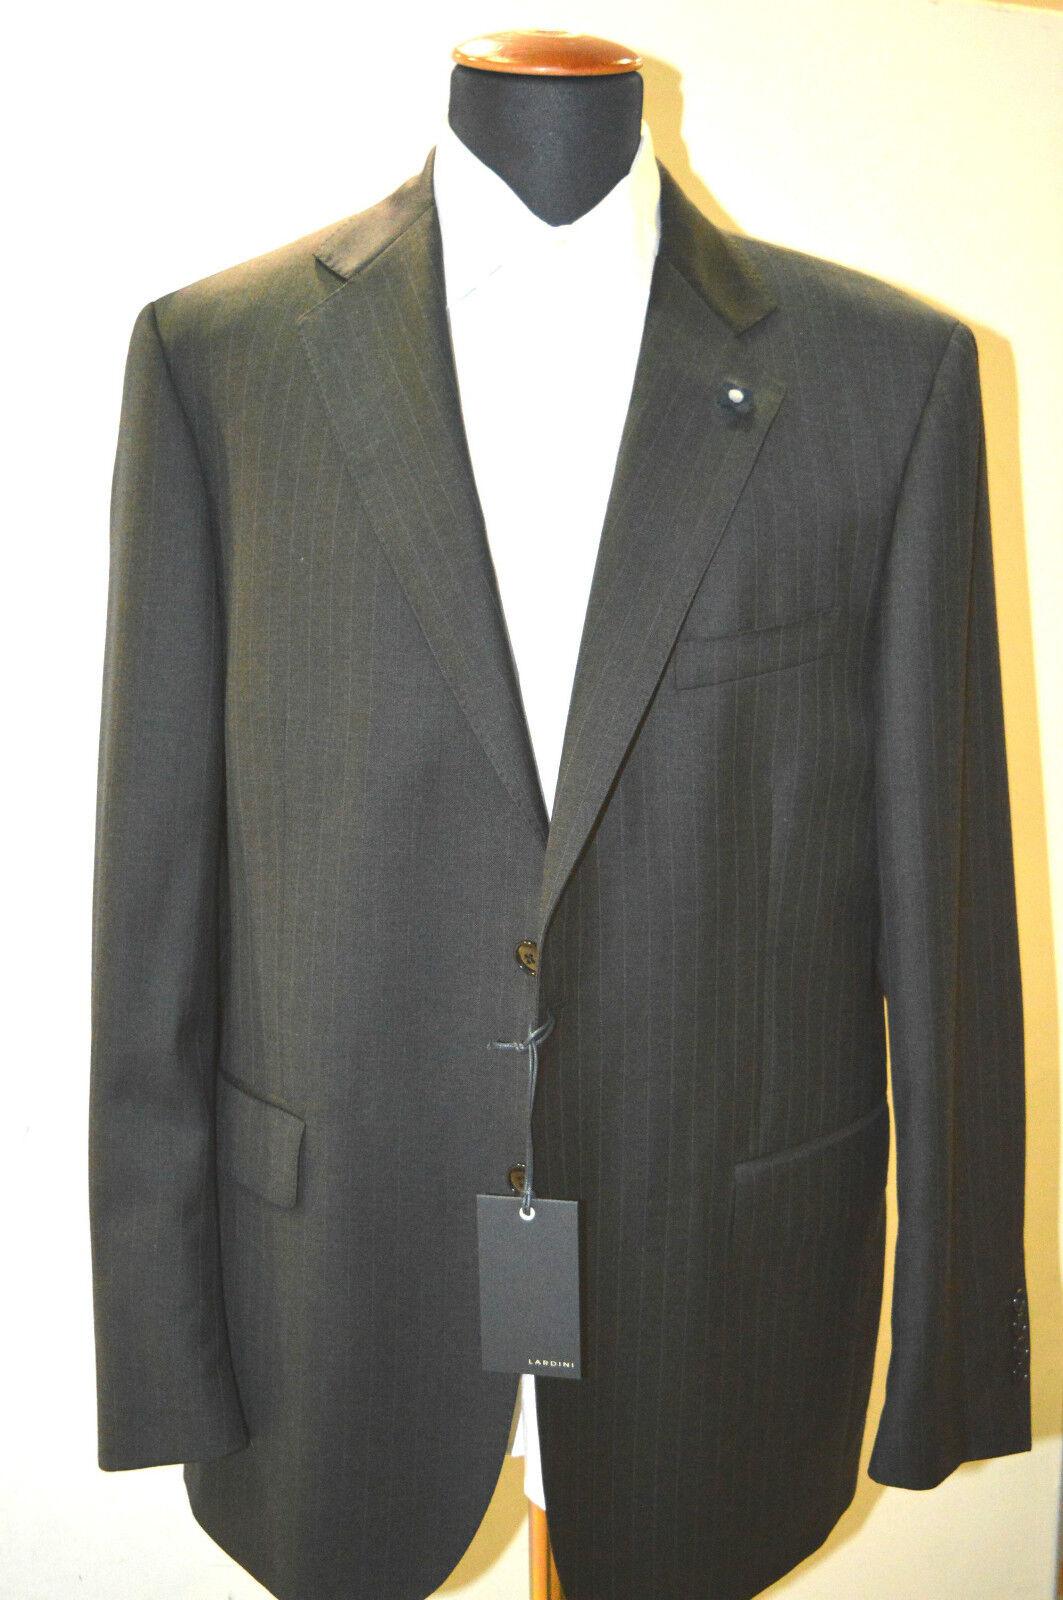 NEW  840,00  LARDINI  grau  Suit  100%  Wool 42  Us 52  Eu Made in   2 BTN